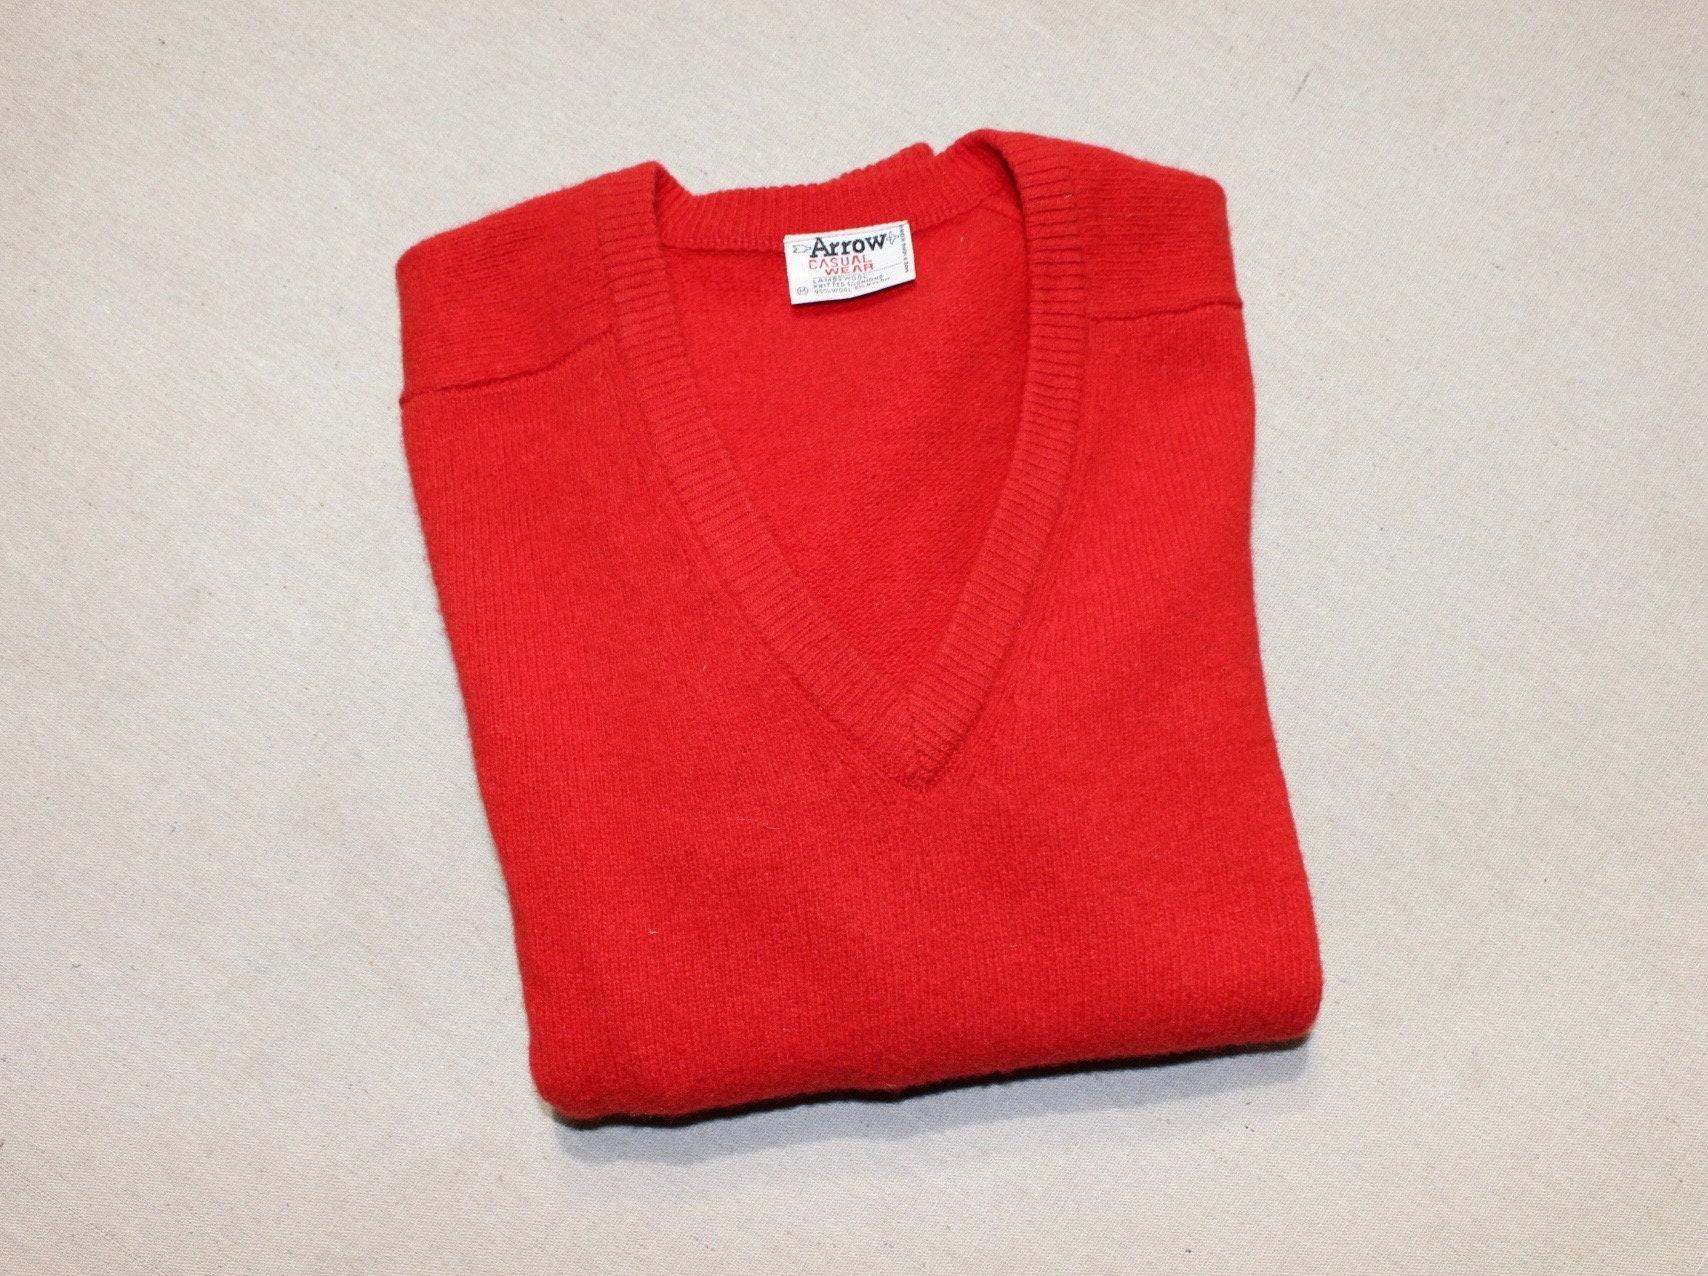 1960s – 70s Men's Ties | Skinny Ties, Slim Ties Vintage 1960s -Arrow- Mens V-Neck Pullover - Saddle Shoulder Sweater.solid Red Lambswool Blend. Made in Hong Kong. Medium Size 40 $41.95 AT vintagedancer.com